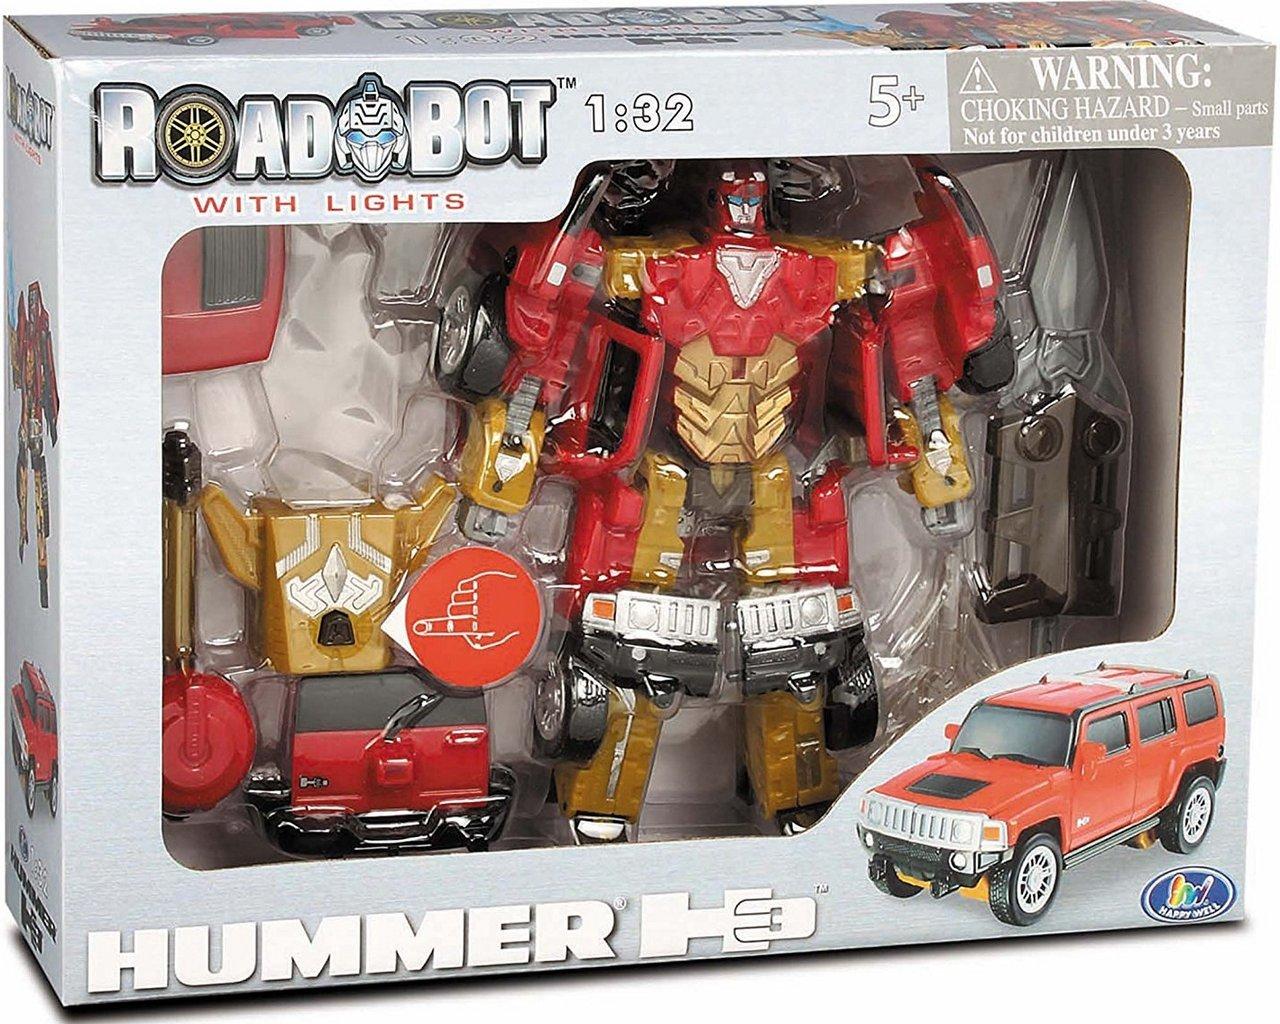 52030 r Robot Transformer - HUMMER (1:32)